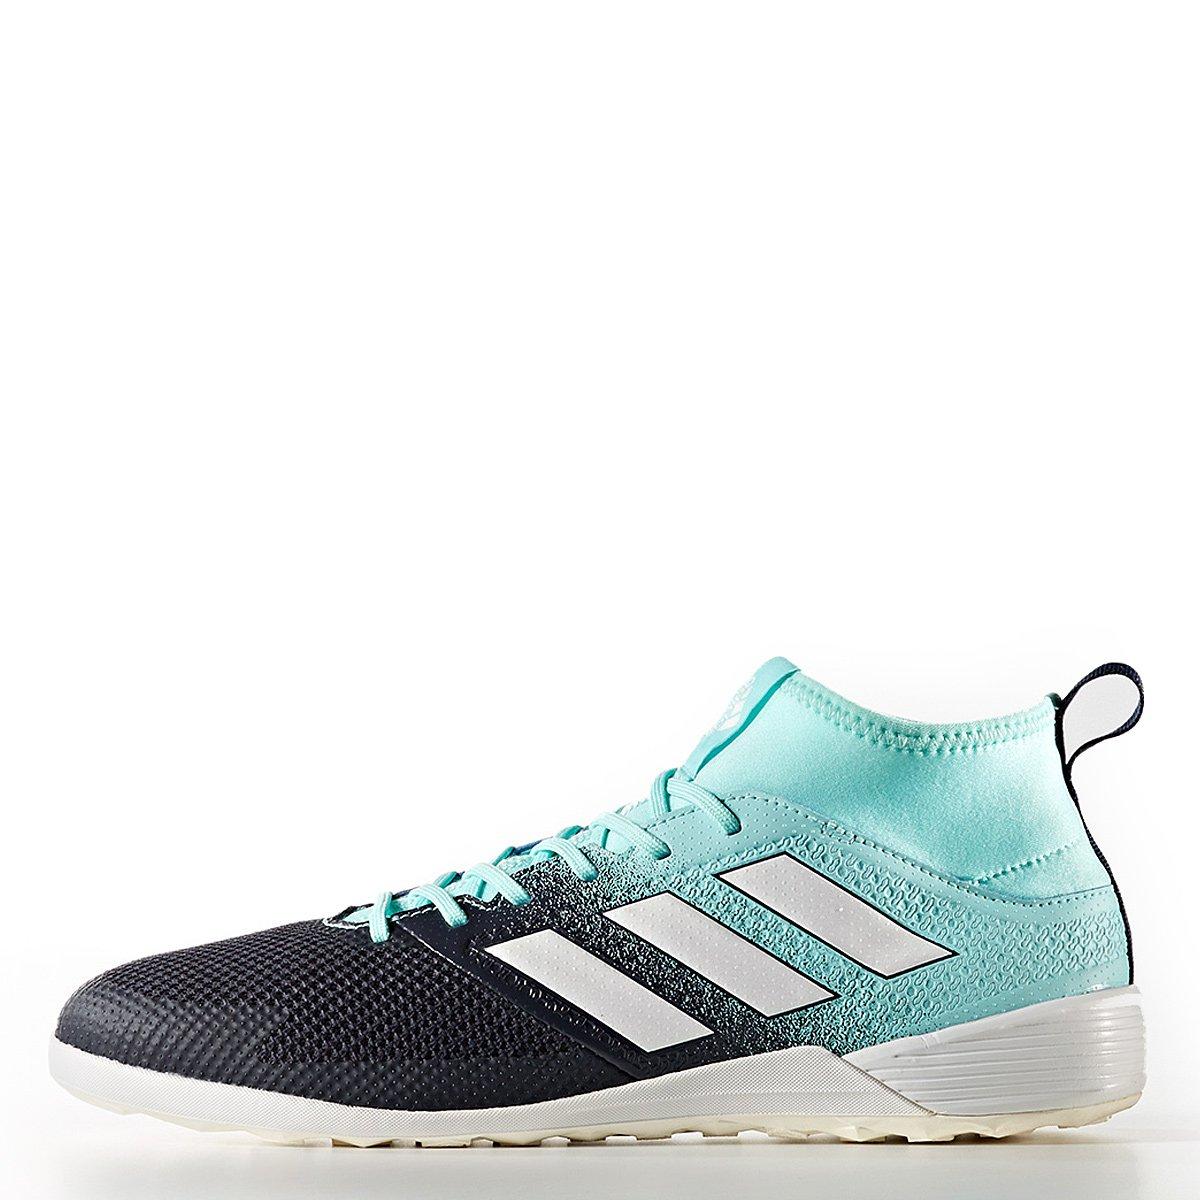 Ace IN Adidas 17 Chuteira Marinho Claro Azul Futsal 3 e Masculina HXEWSq